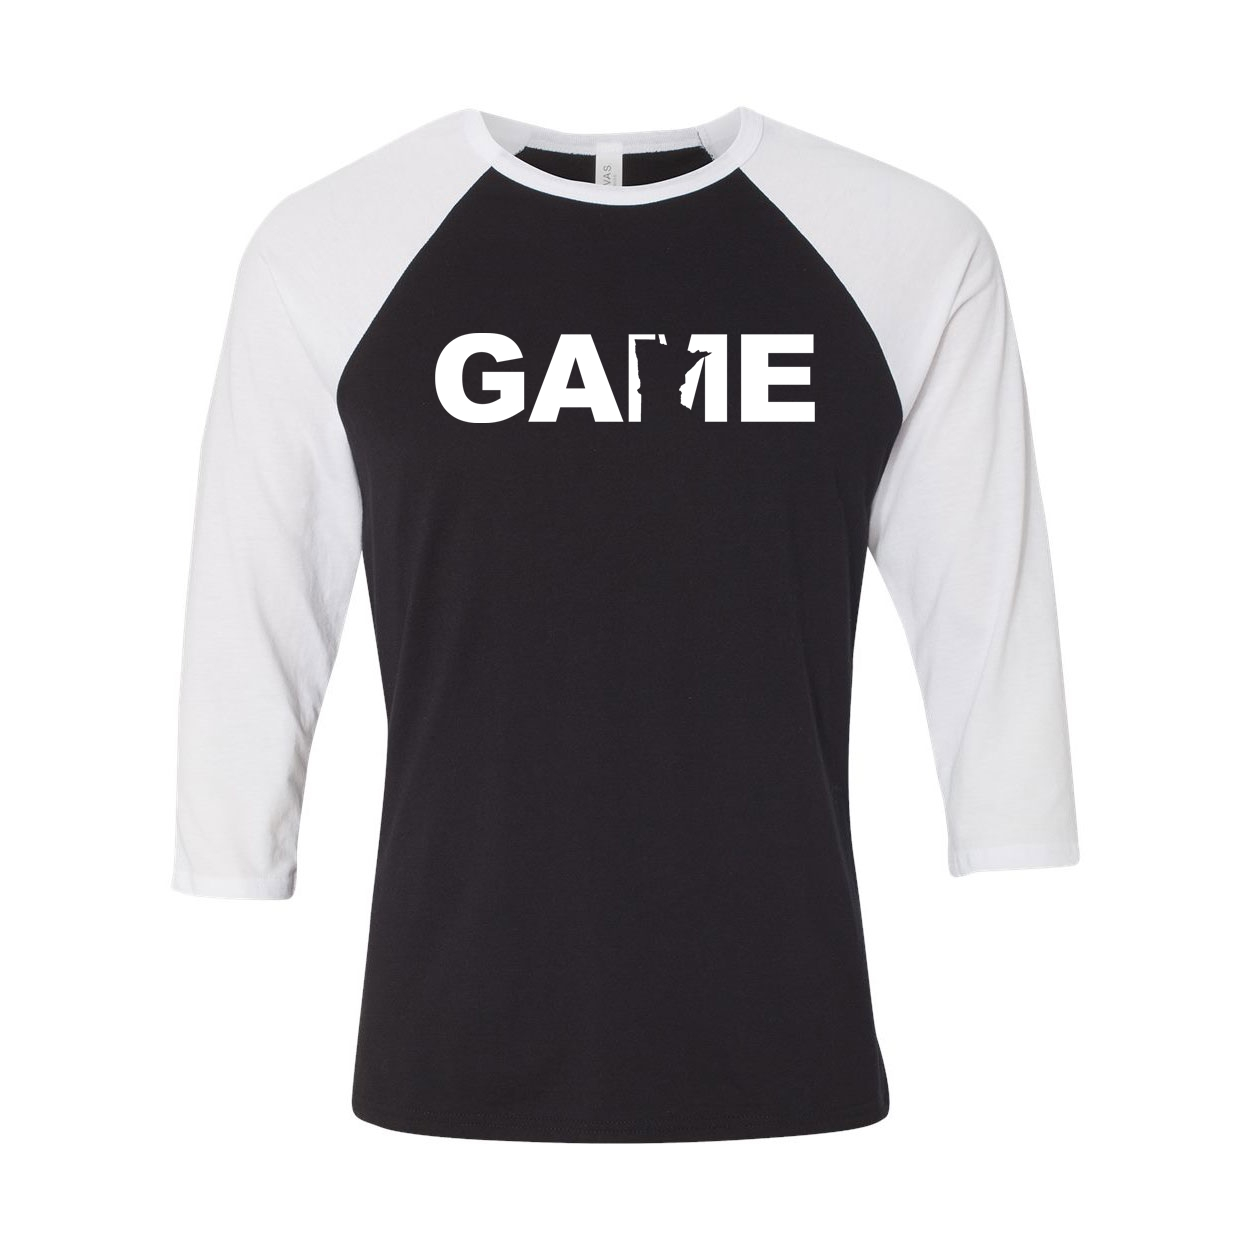 Game Minnesota Classic Raglan Shirt Black/White (White Logo)